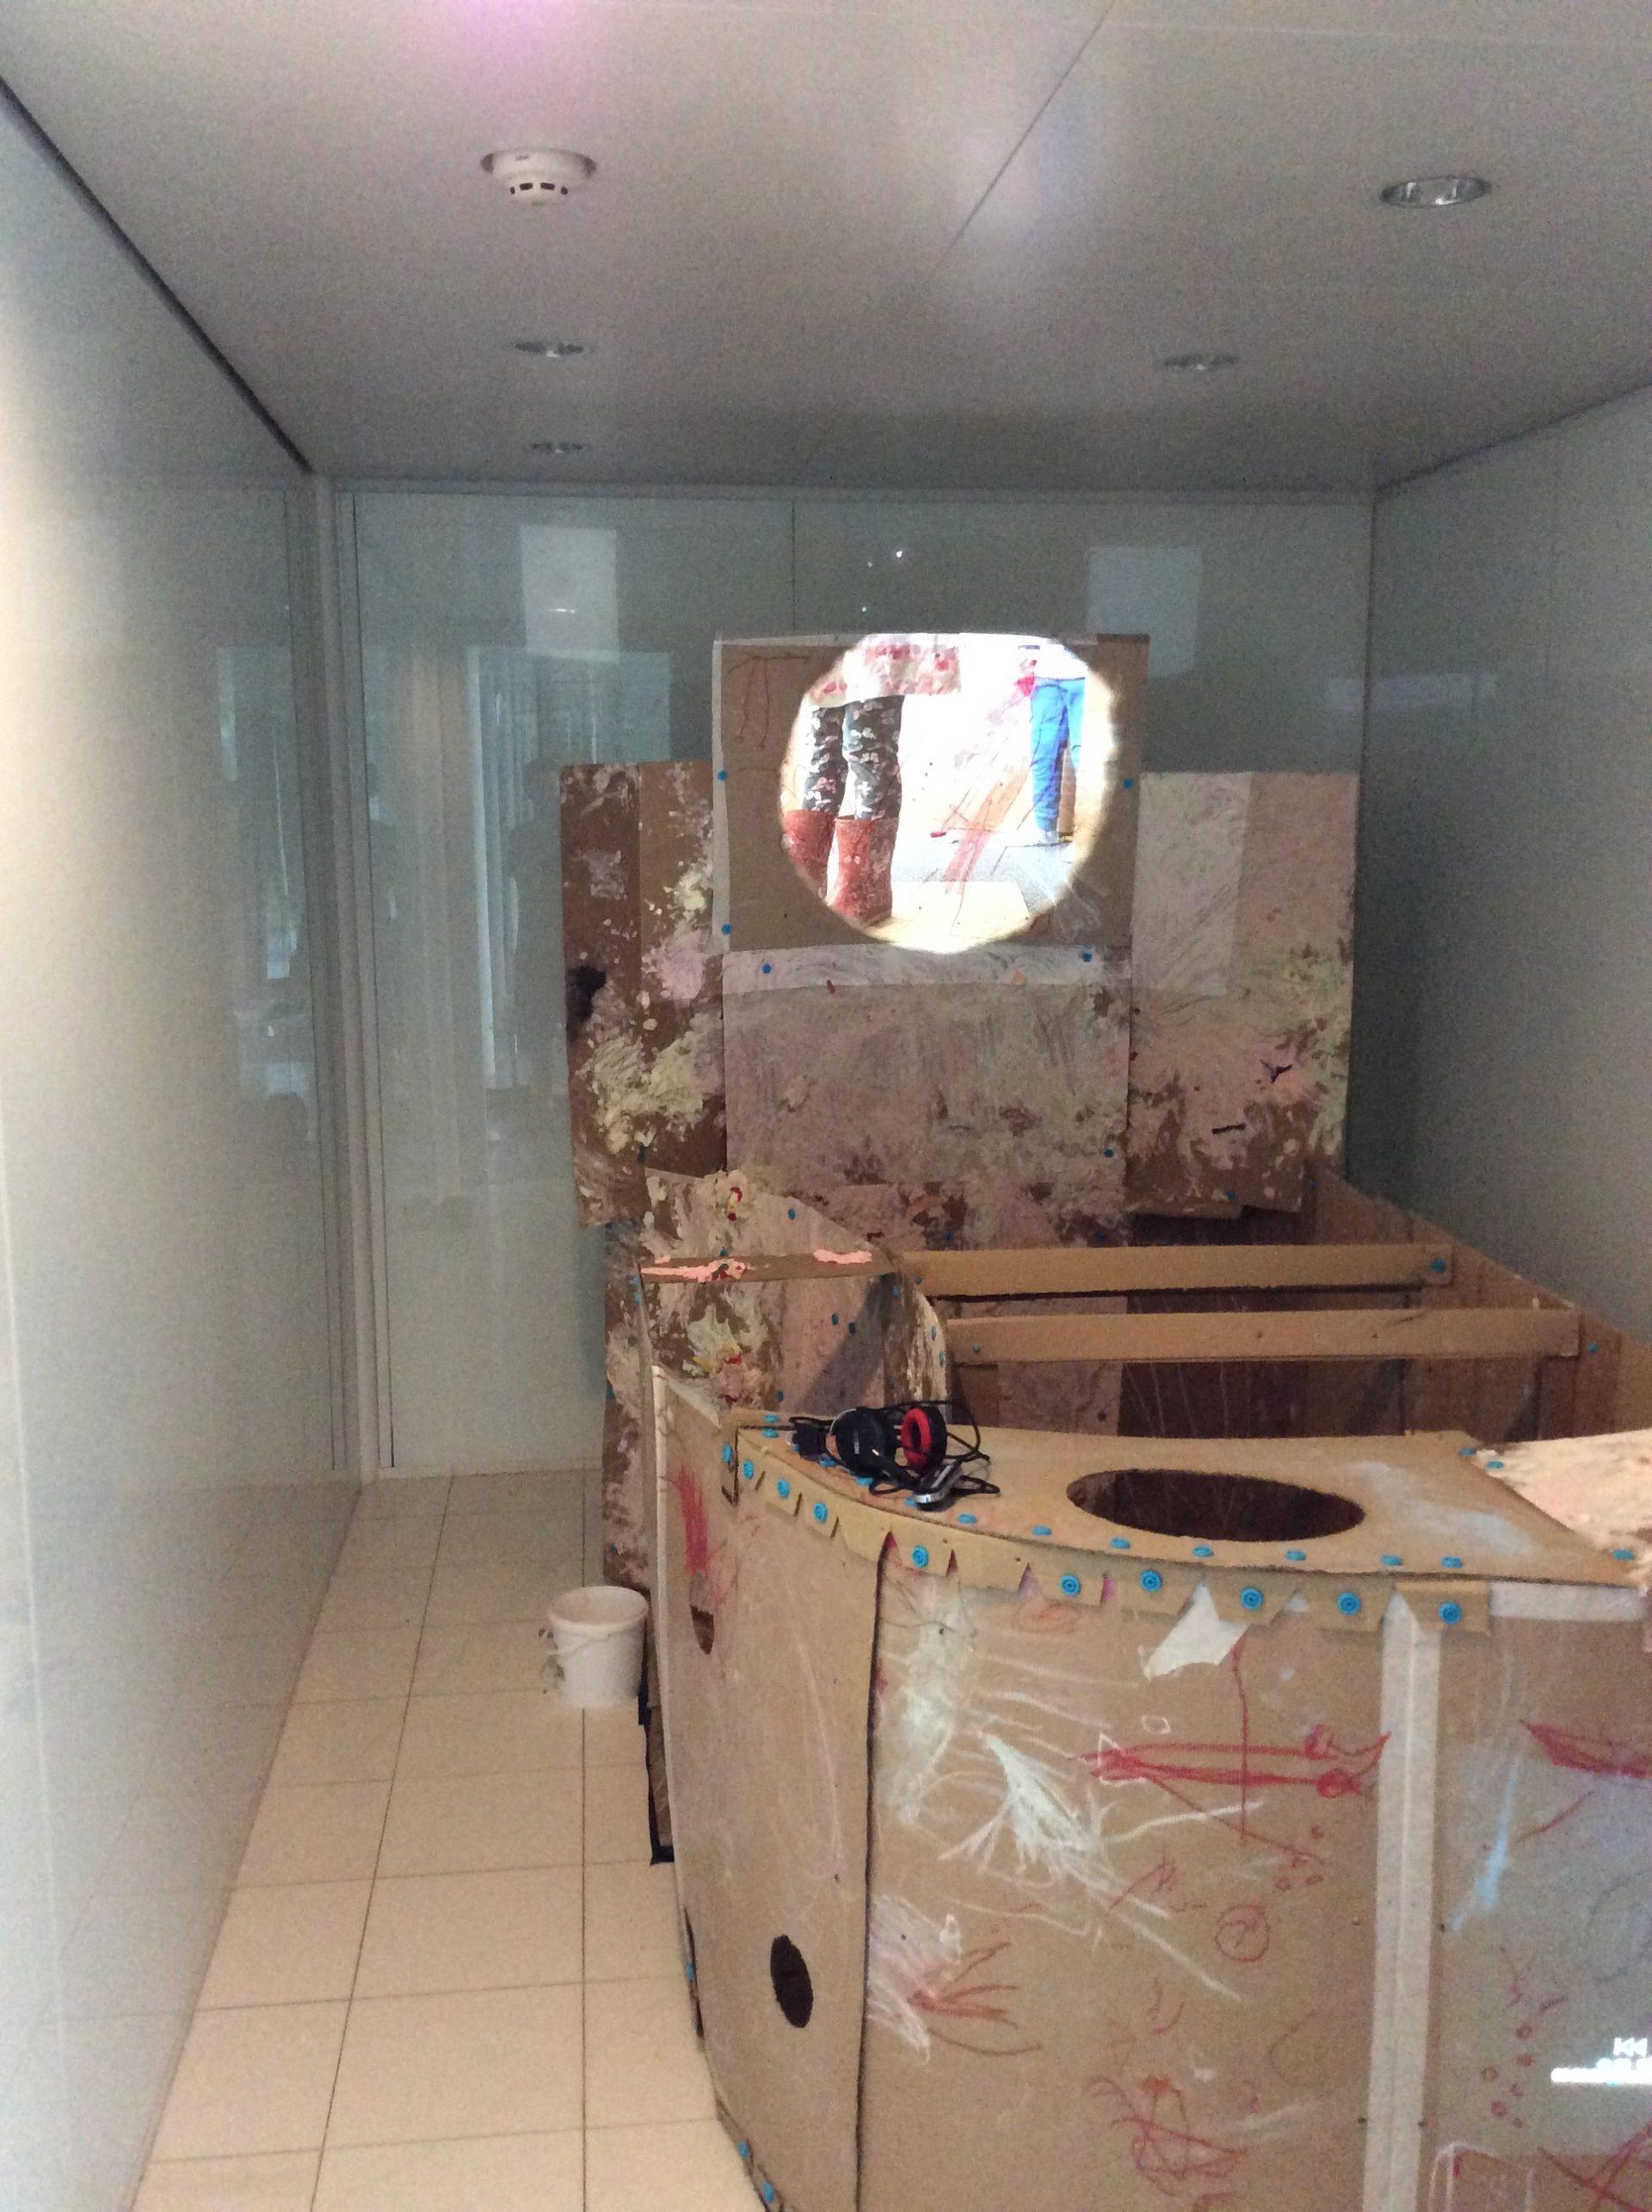 cardboard, white walls, projected legs in wellies